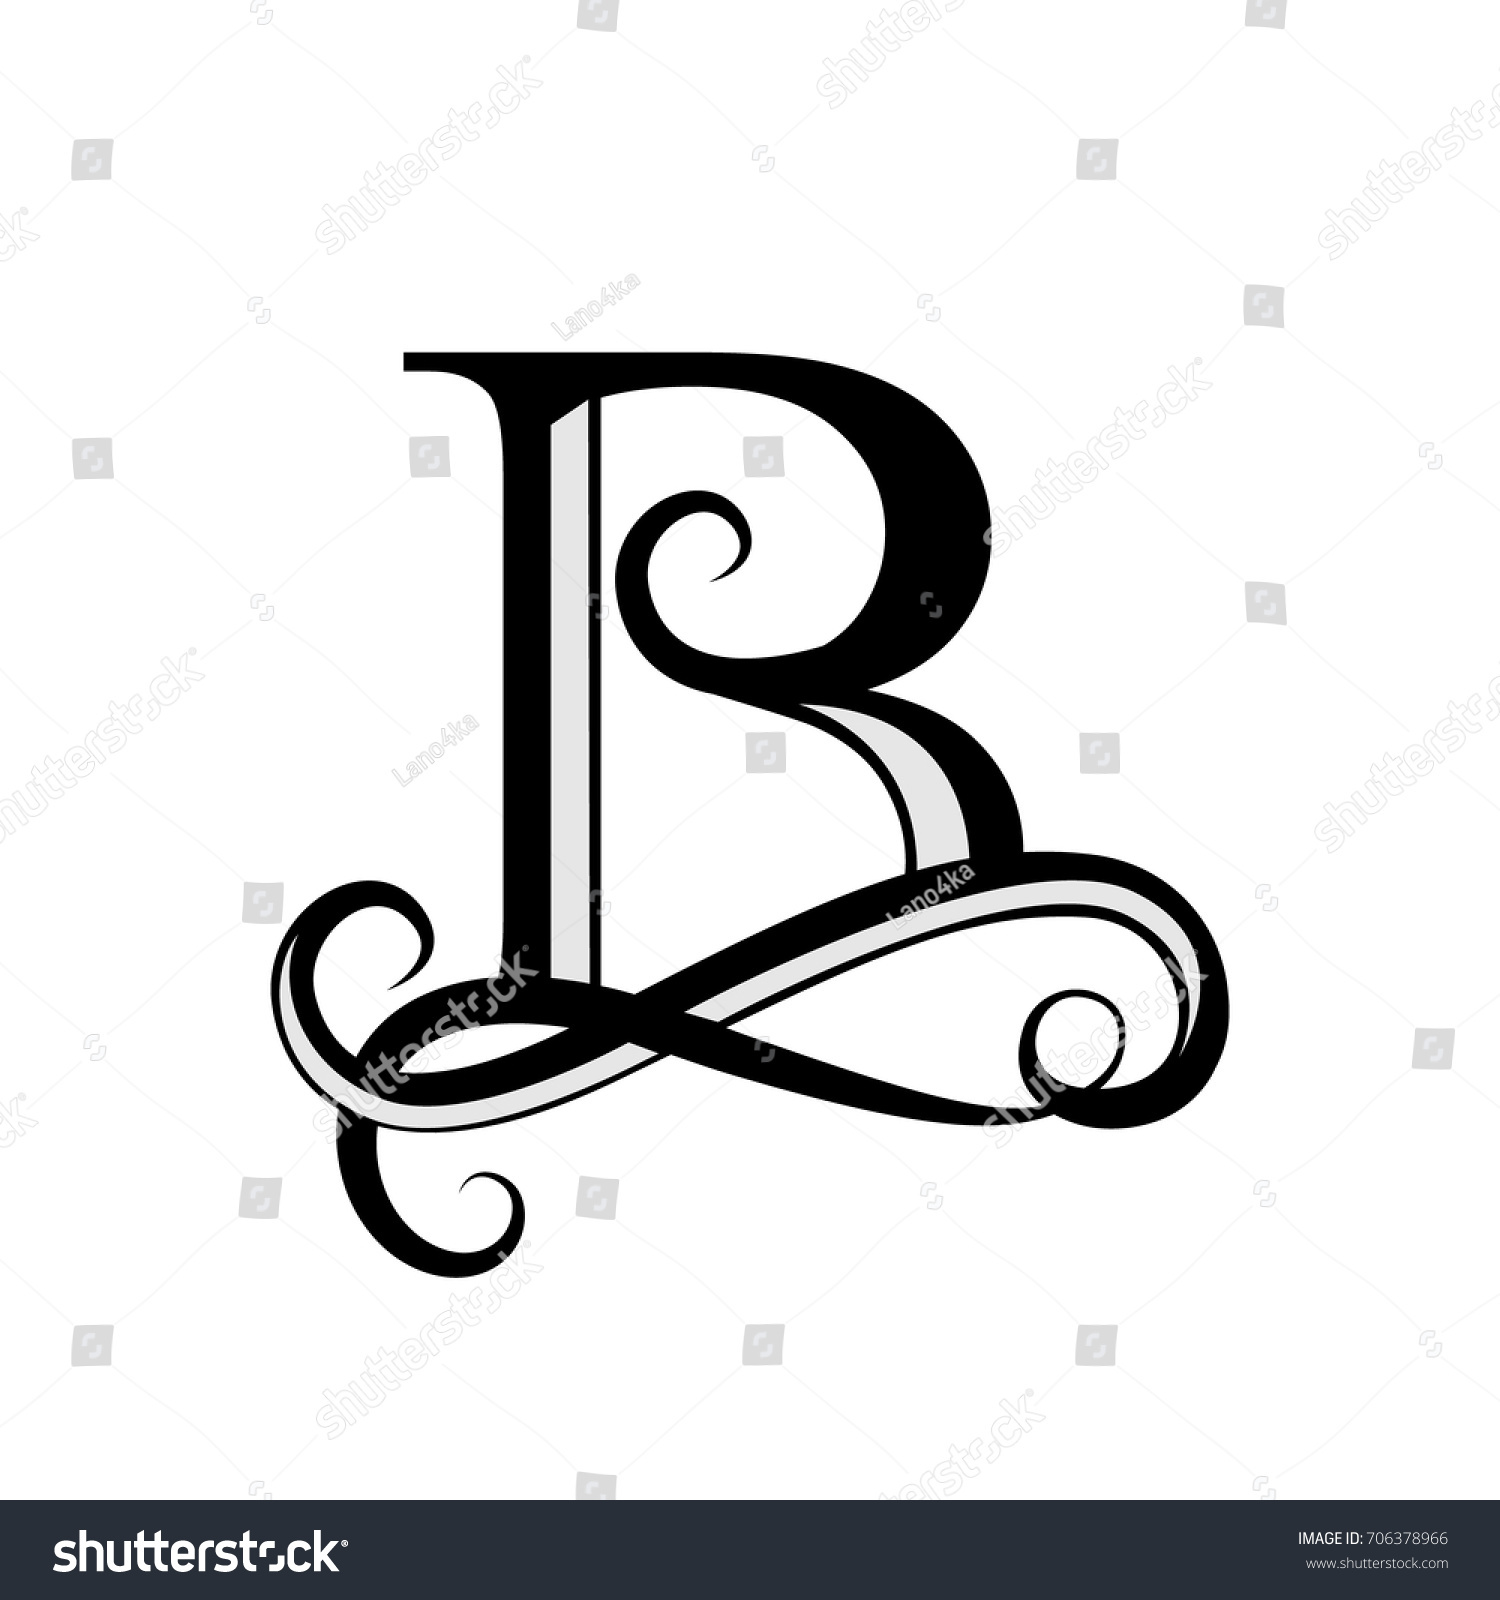 Capital Letter For Monograms And Logos Beautiful Black Vector B Design